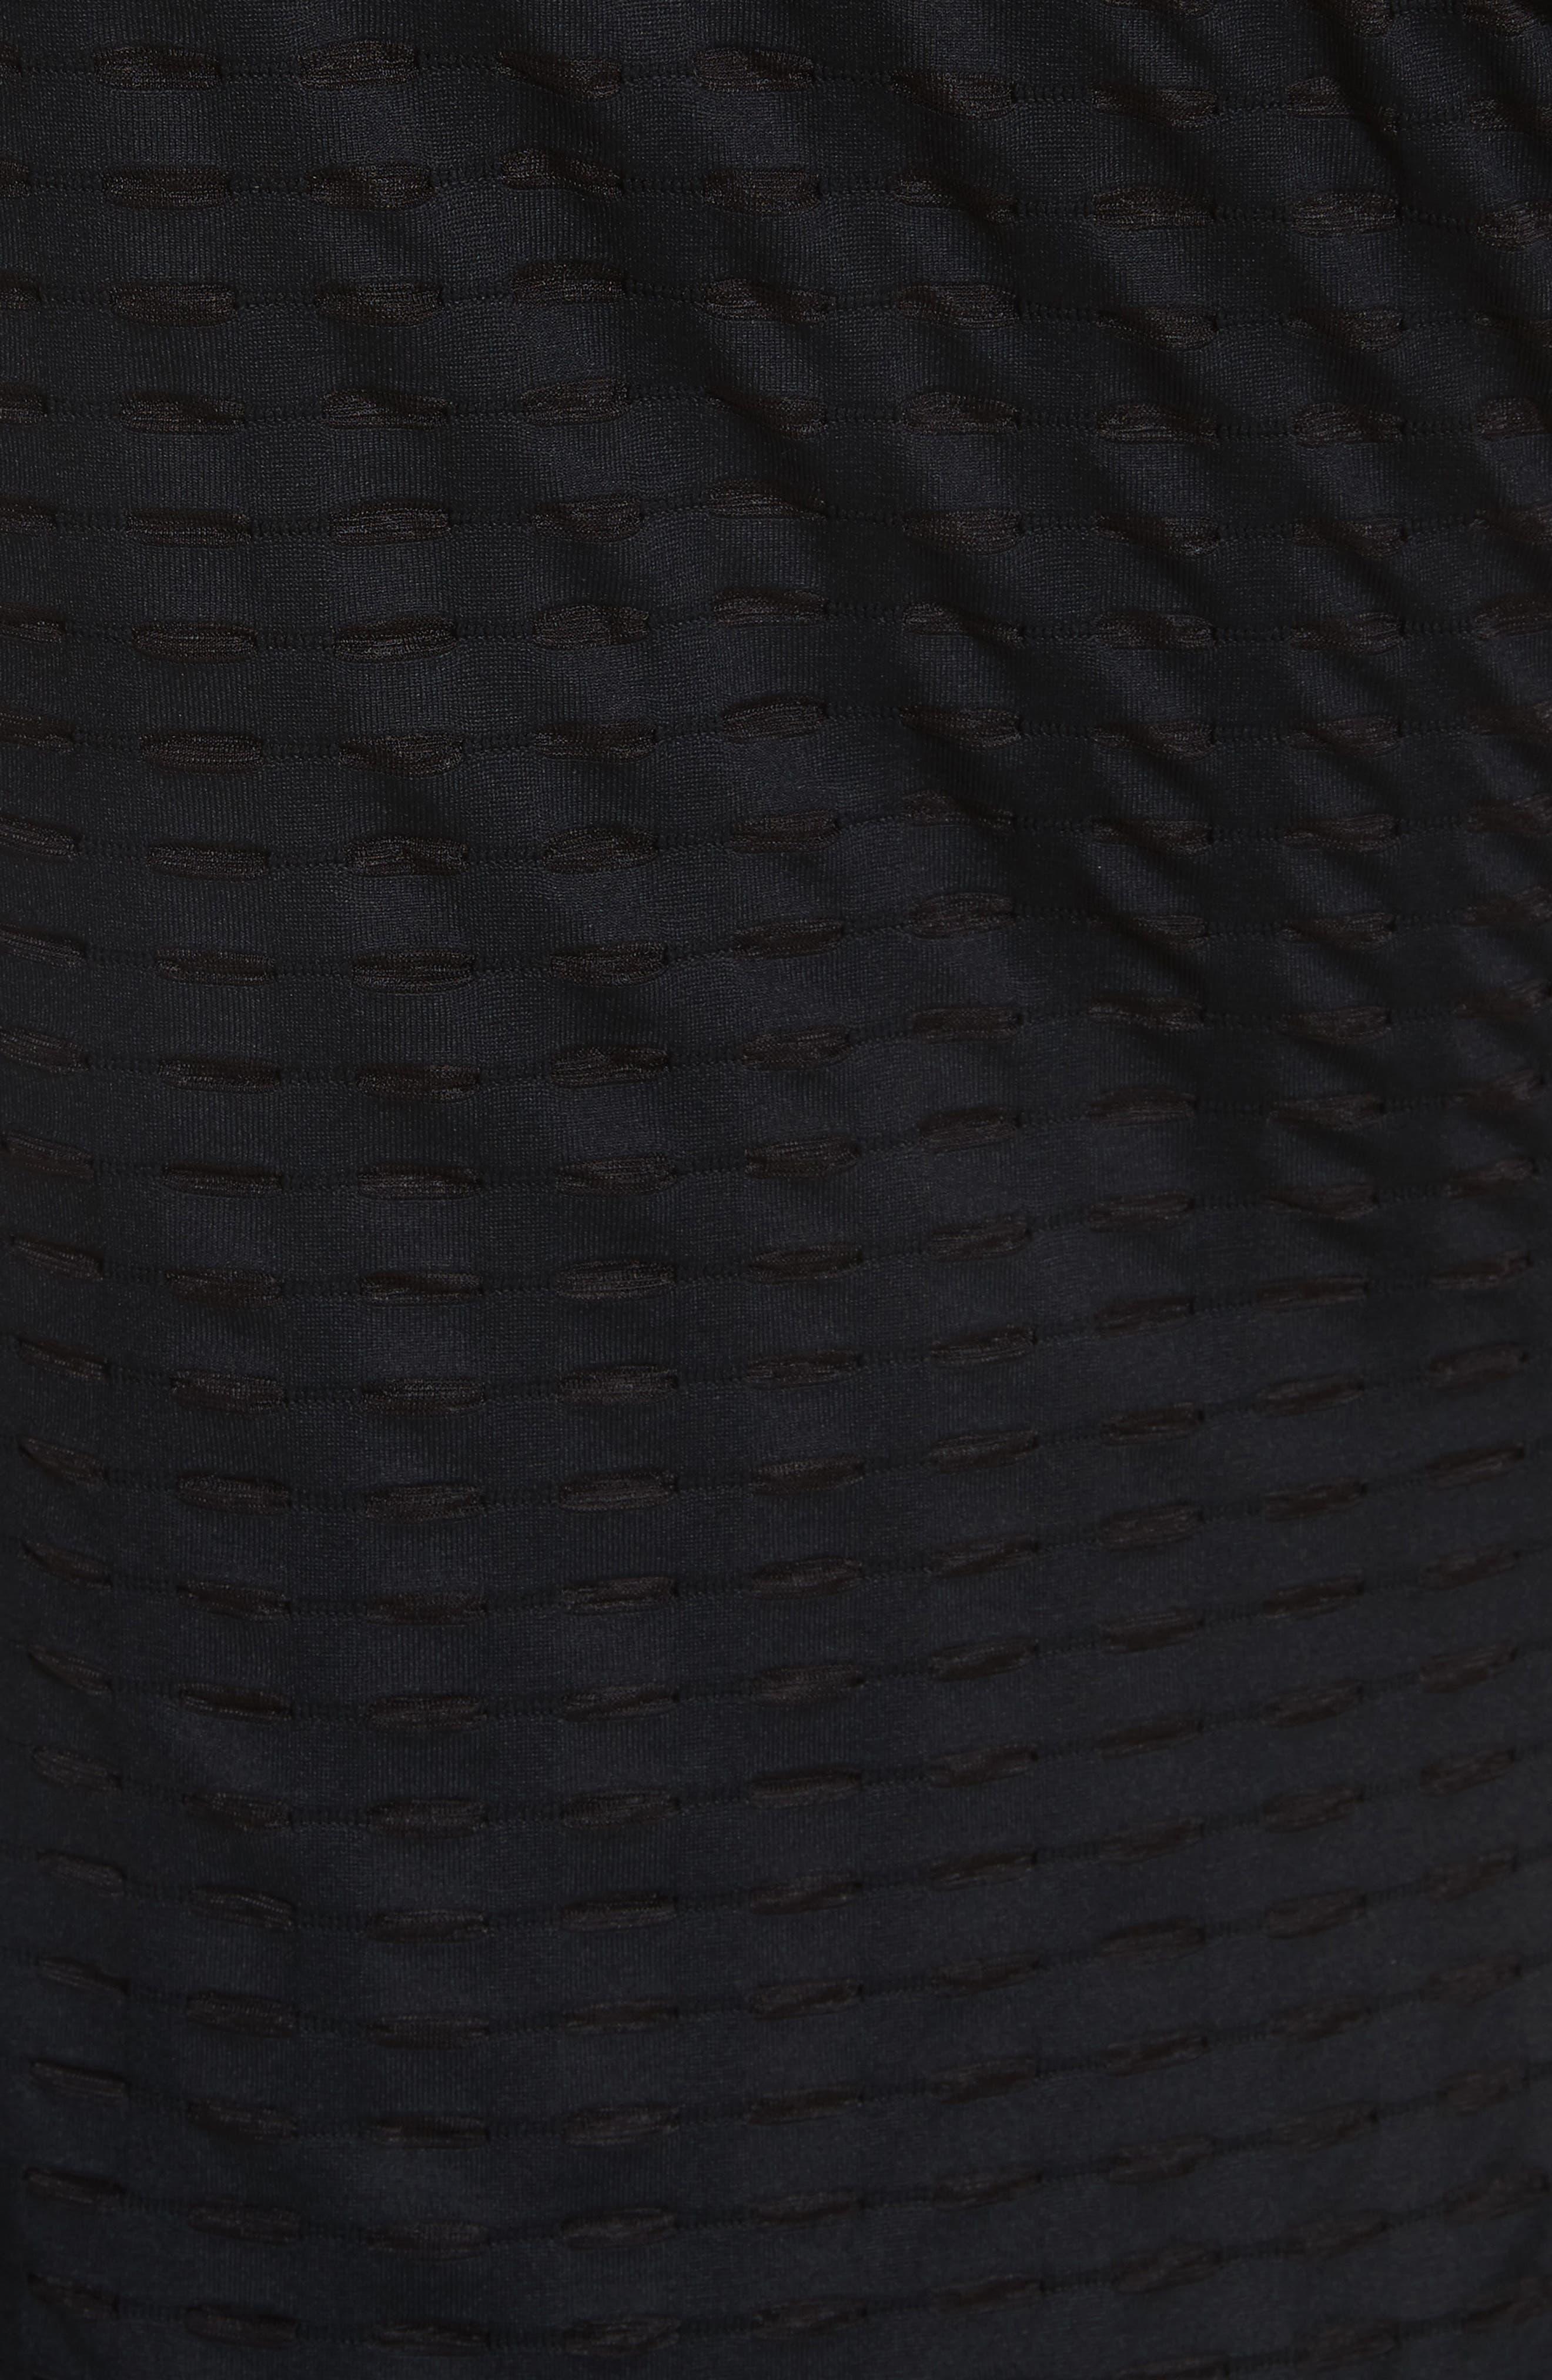 One-Shoulder Minidress,                             Alternate thumbnail 5, color,                             001